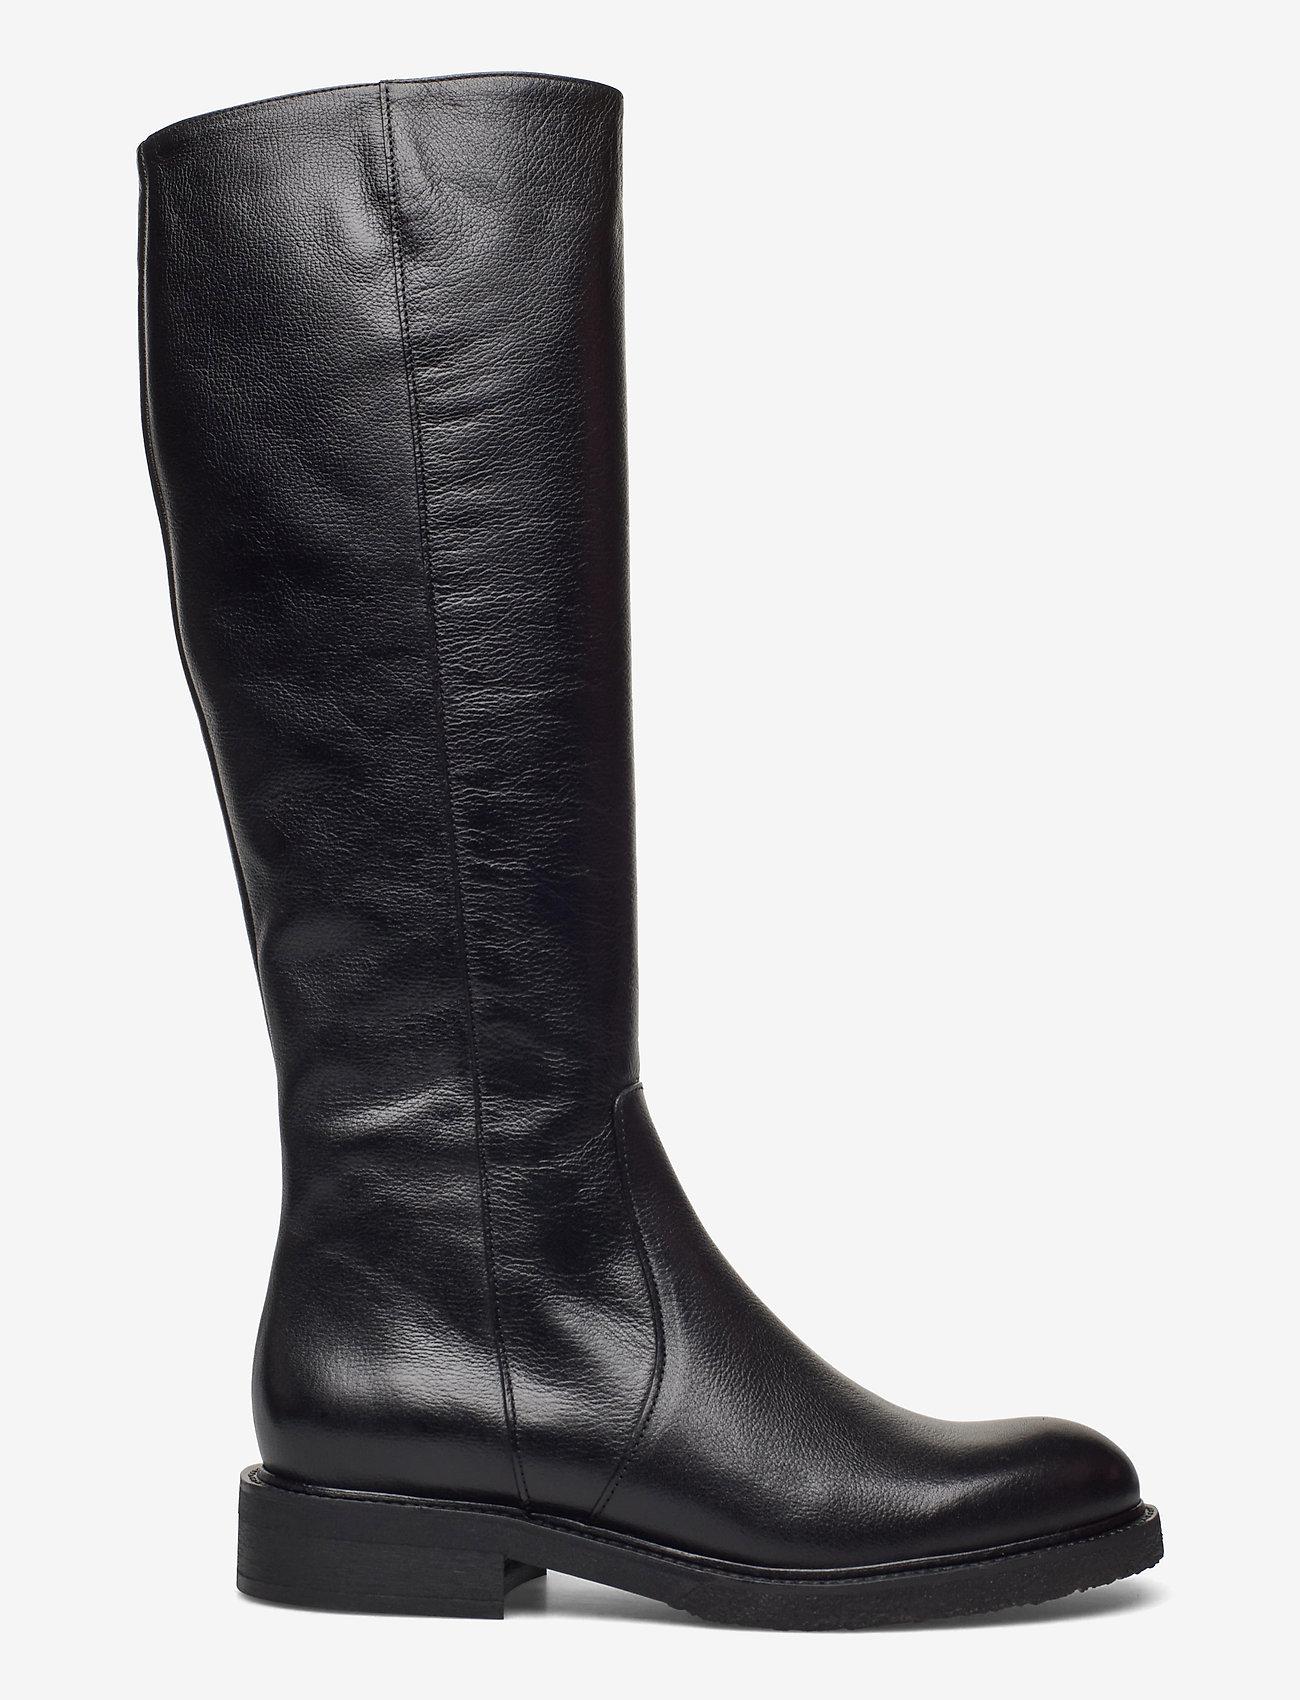 Billi Bi - Long Boots 4854 - höga stövlar - black calf 80 - 1